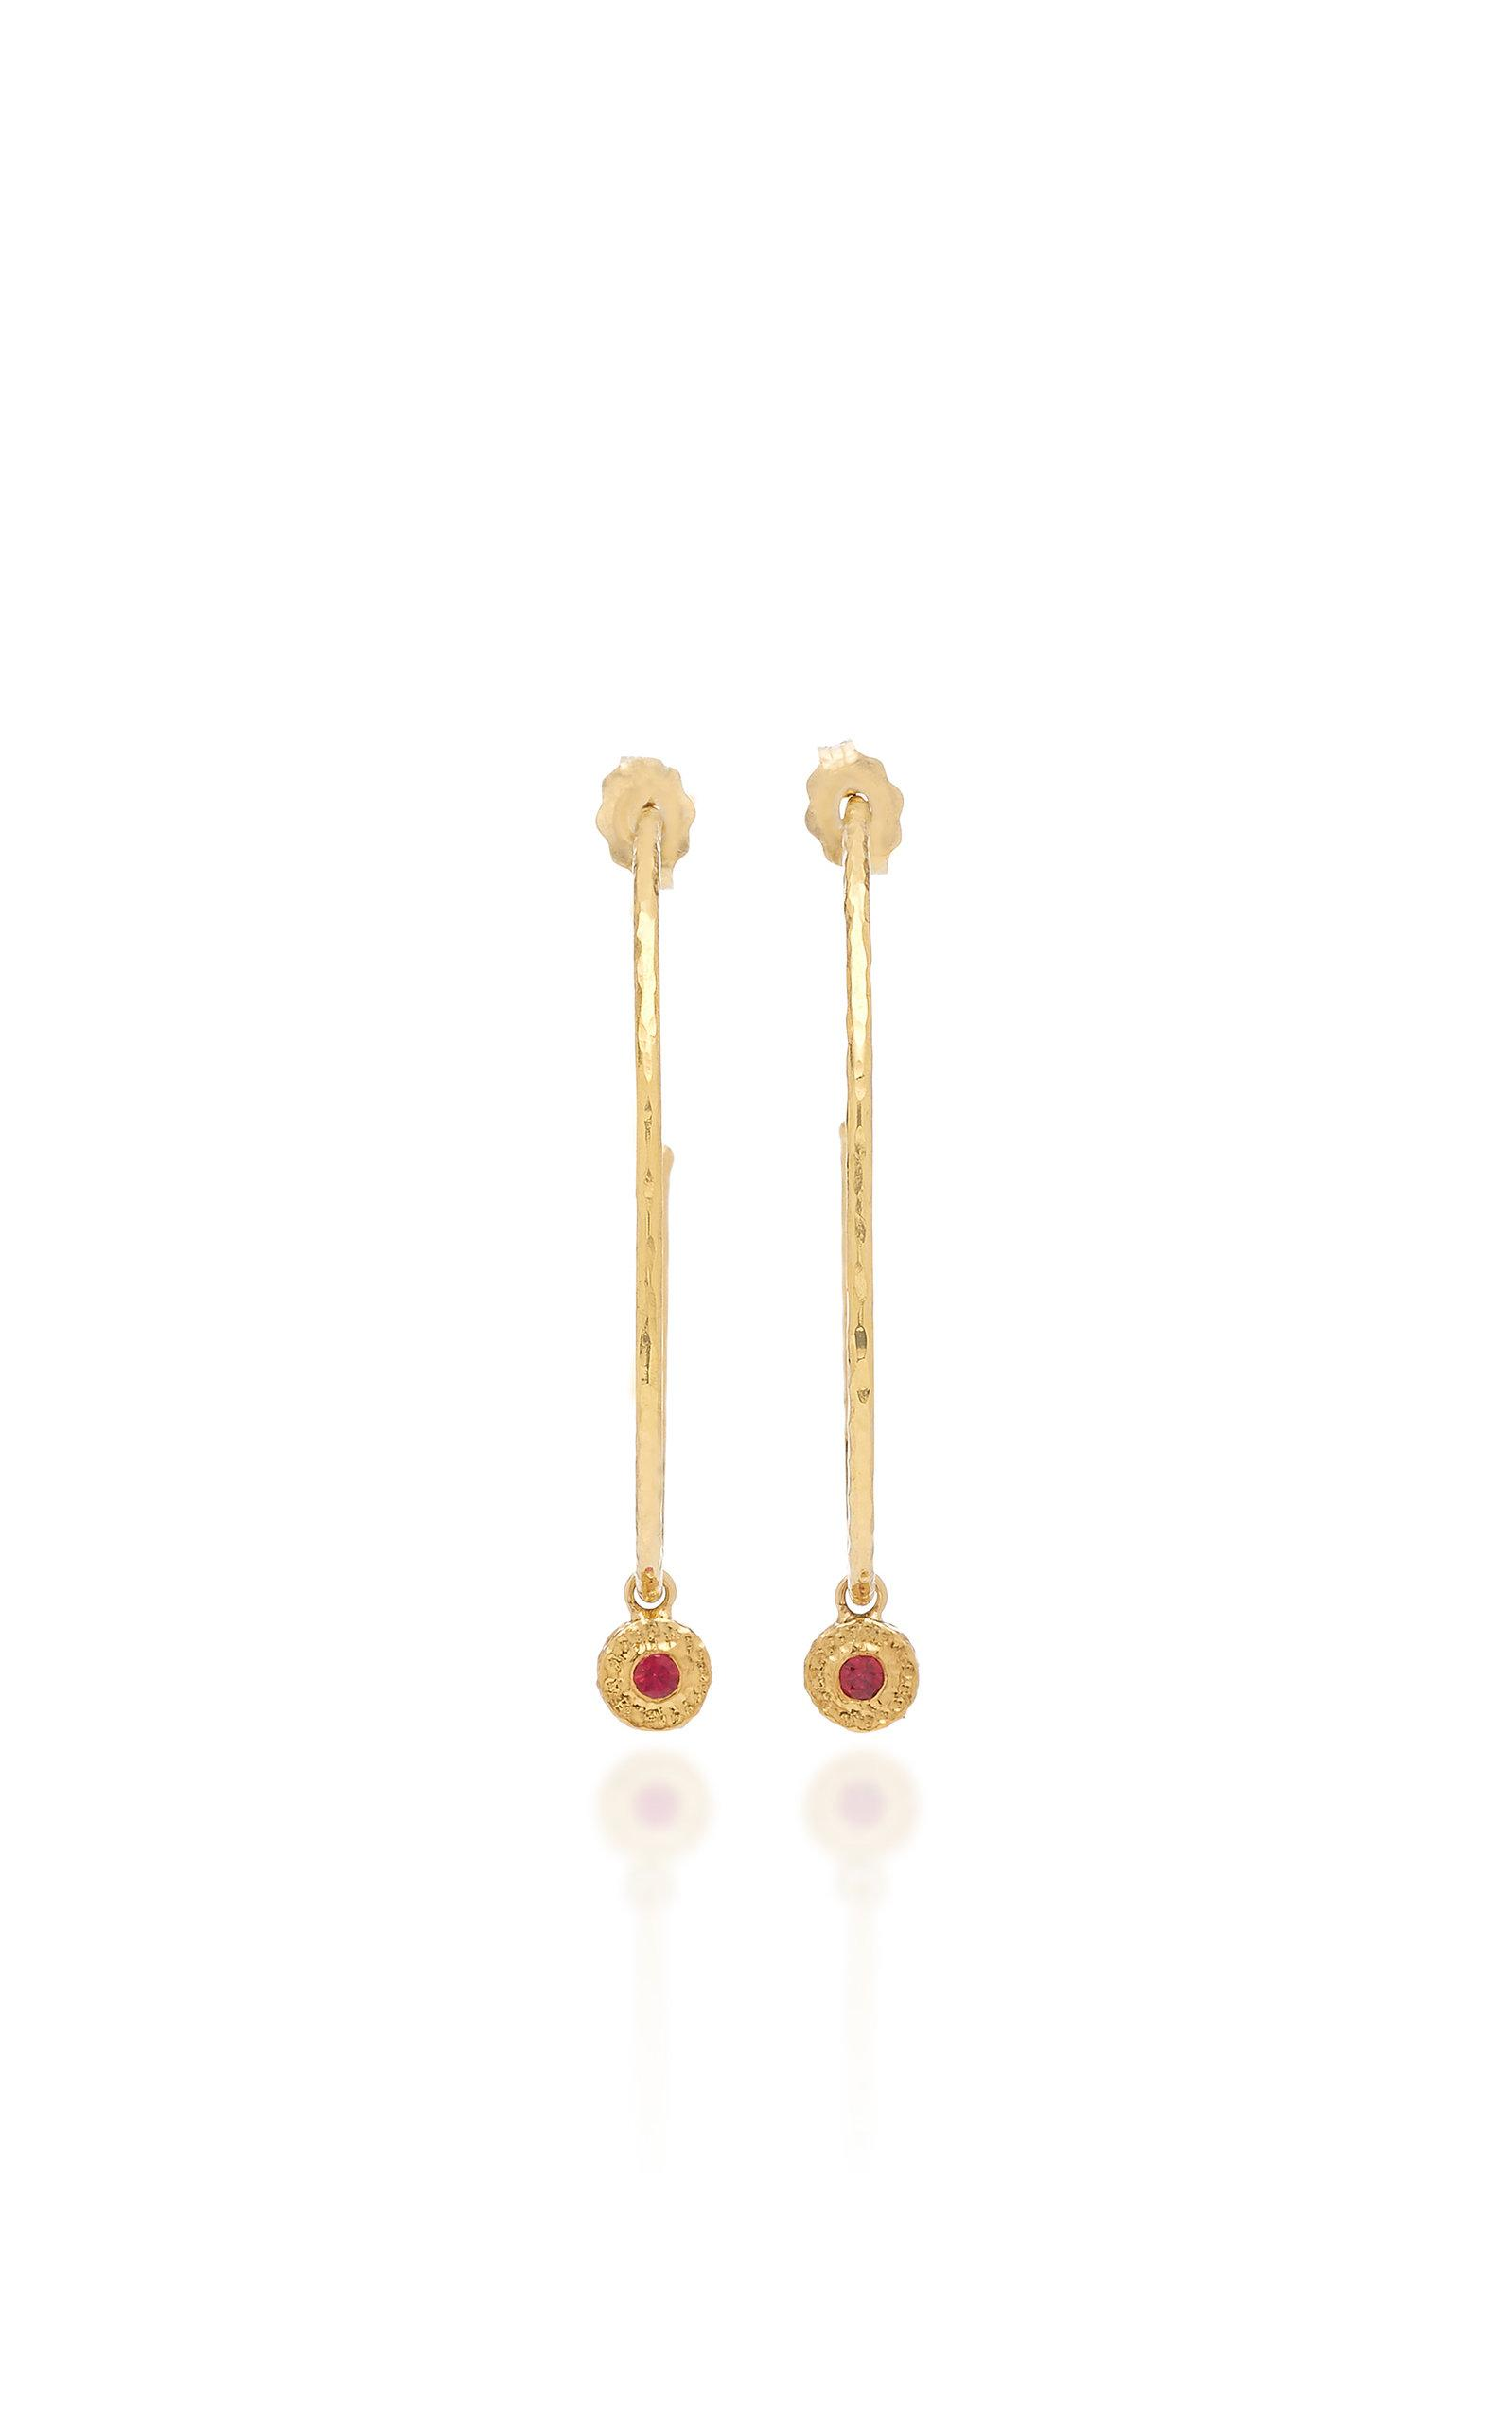 Nesting Gem Tourmaline and 18K Gold Drop Earrings Octavia Elizabeth DFeC0bz2